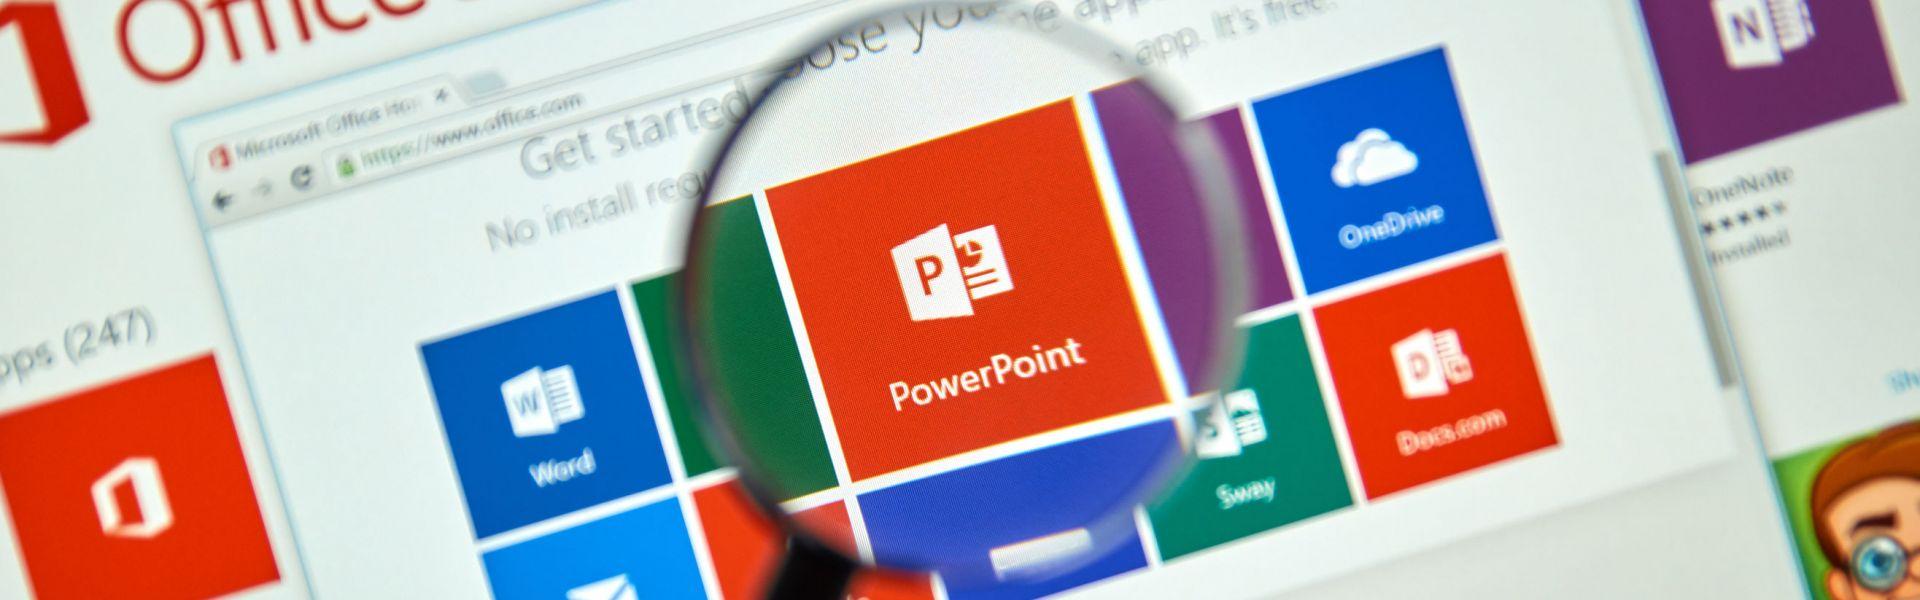 Download Power Point - Lavori in Power Point divertenti